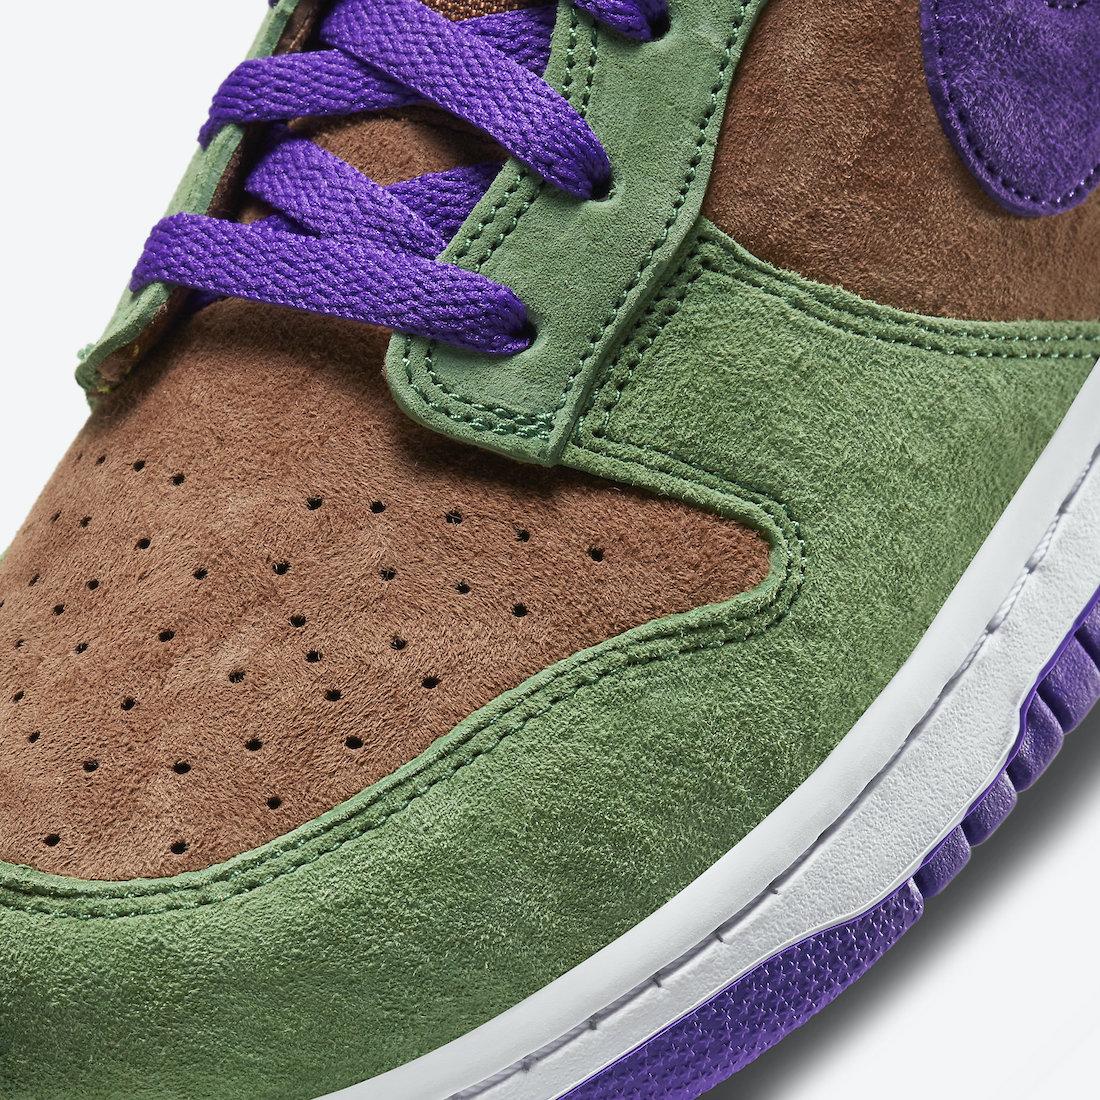 Nike-Dunk-Veneer-DA1469-200-Release-Date-Price-6